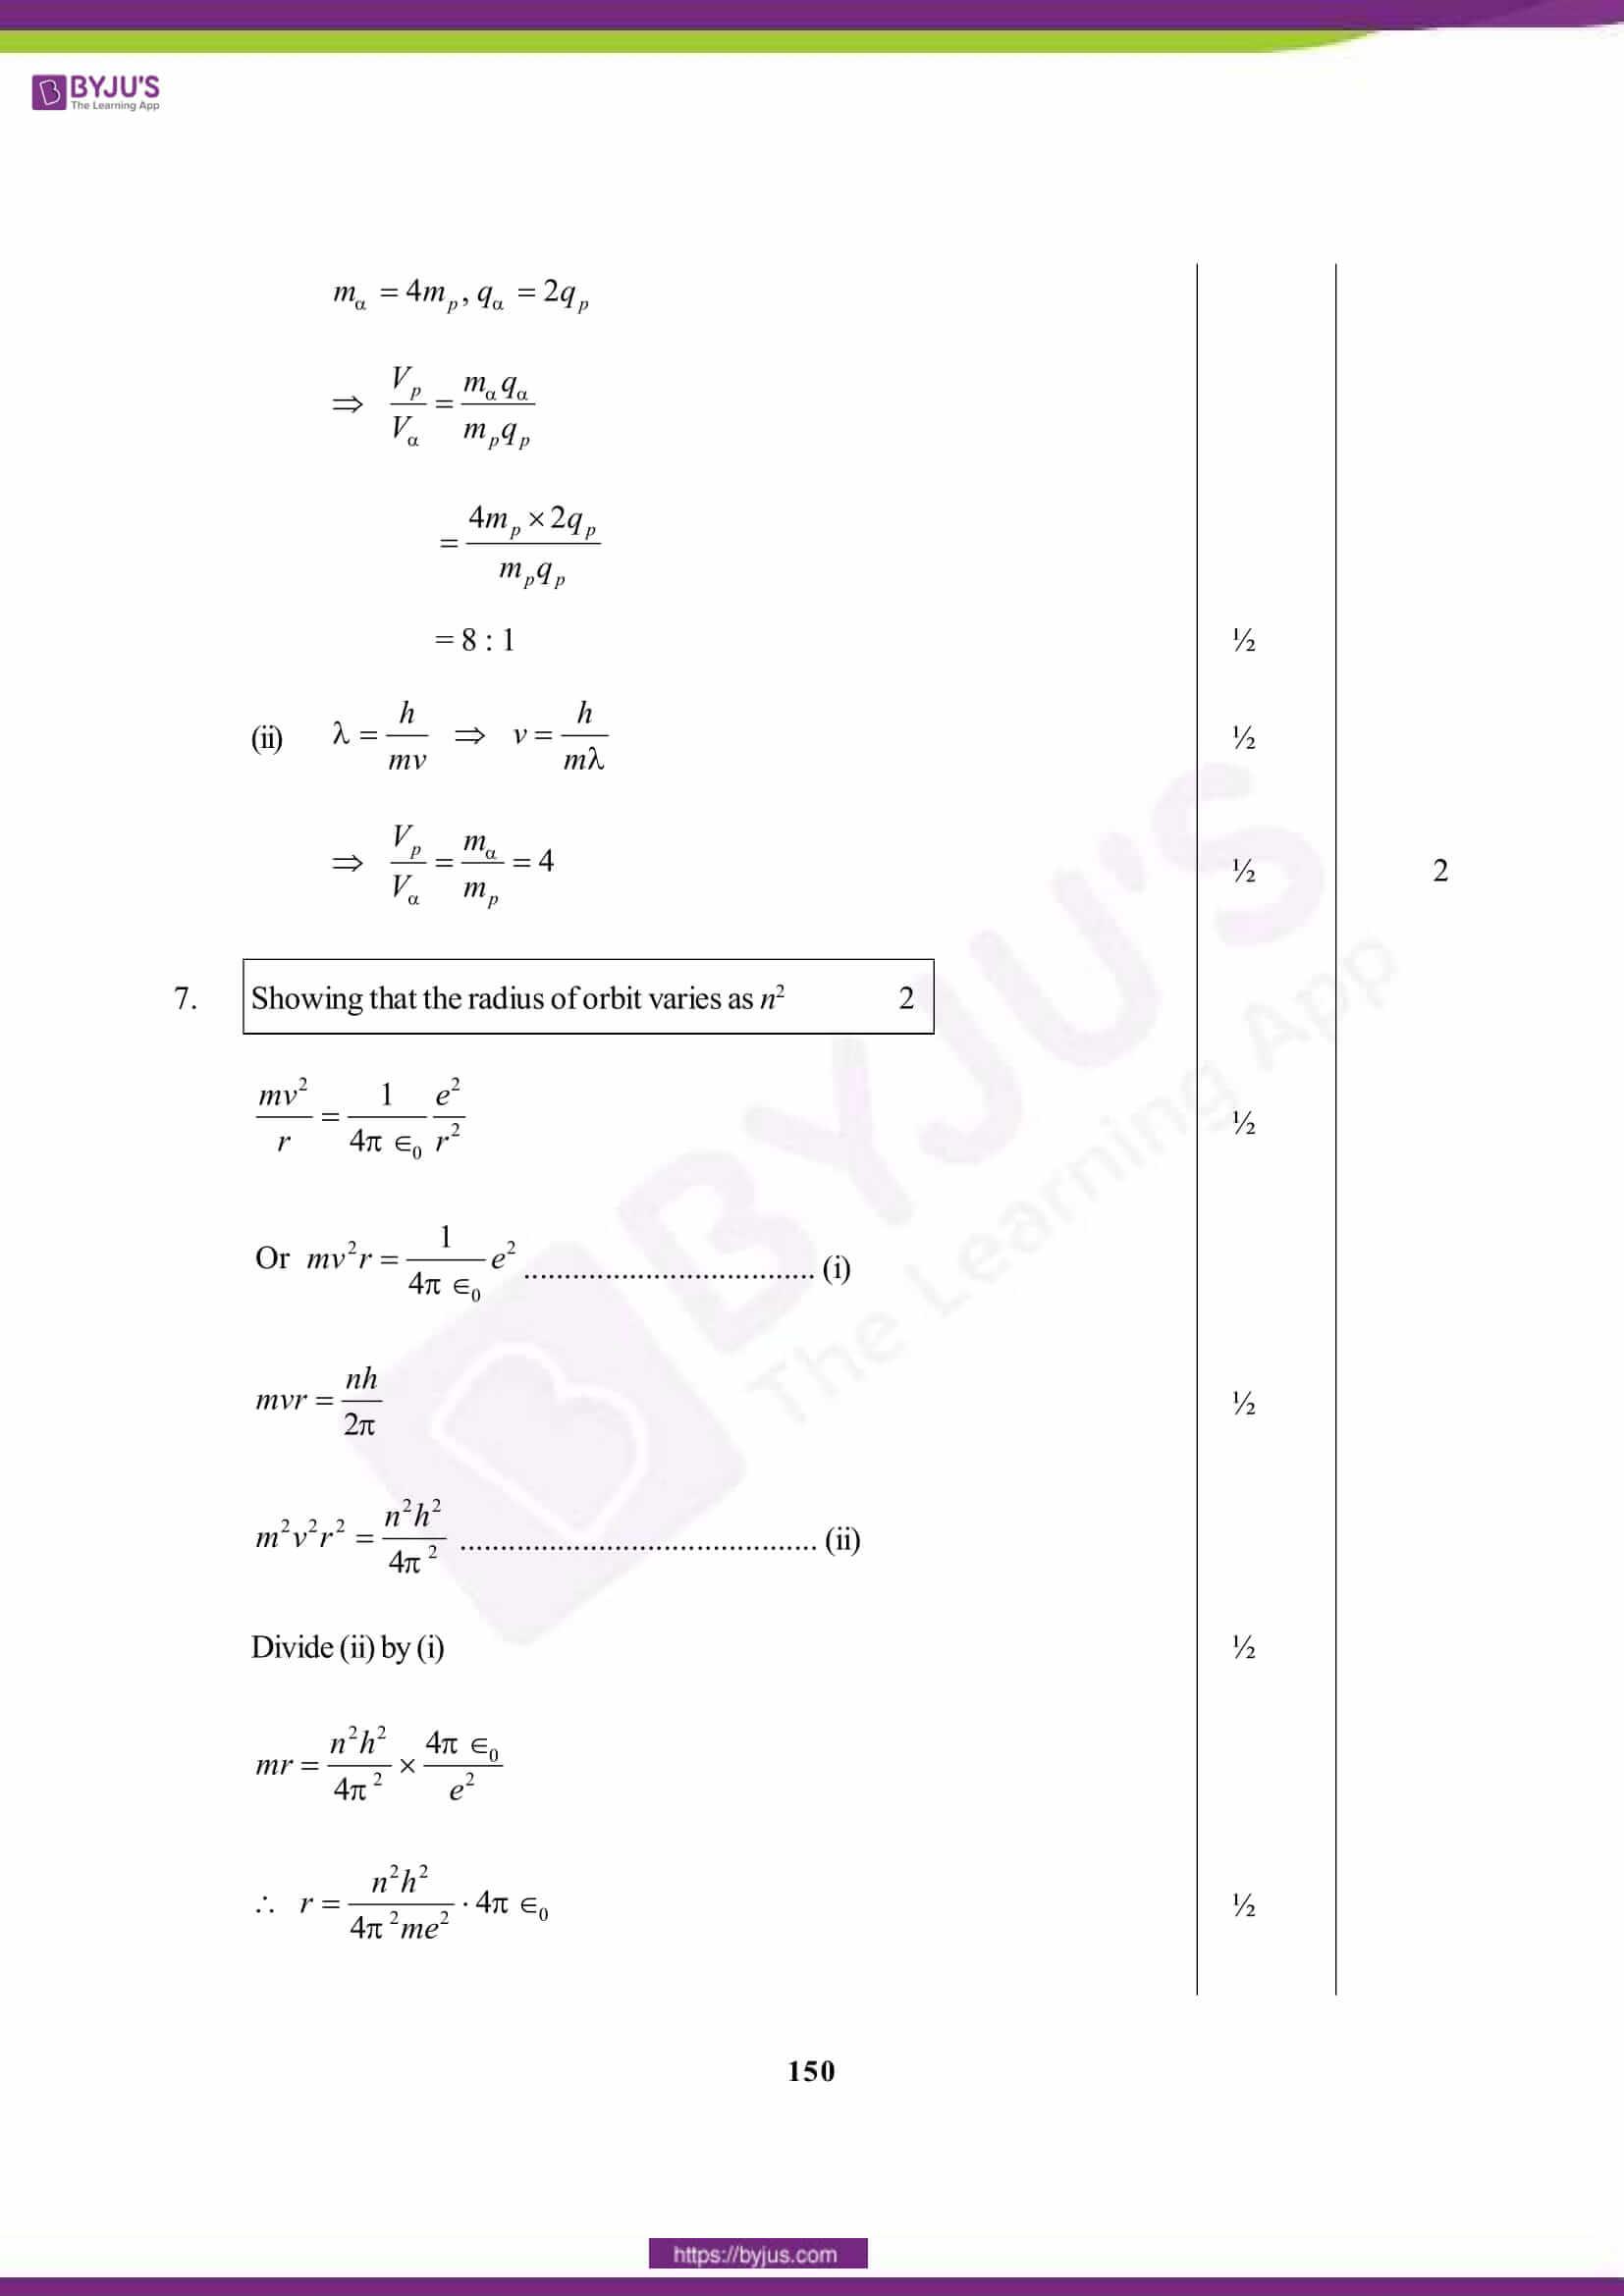 cbse class 12 phy 2015 solution set 1